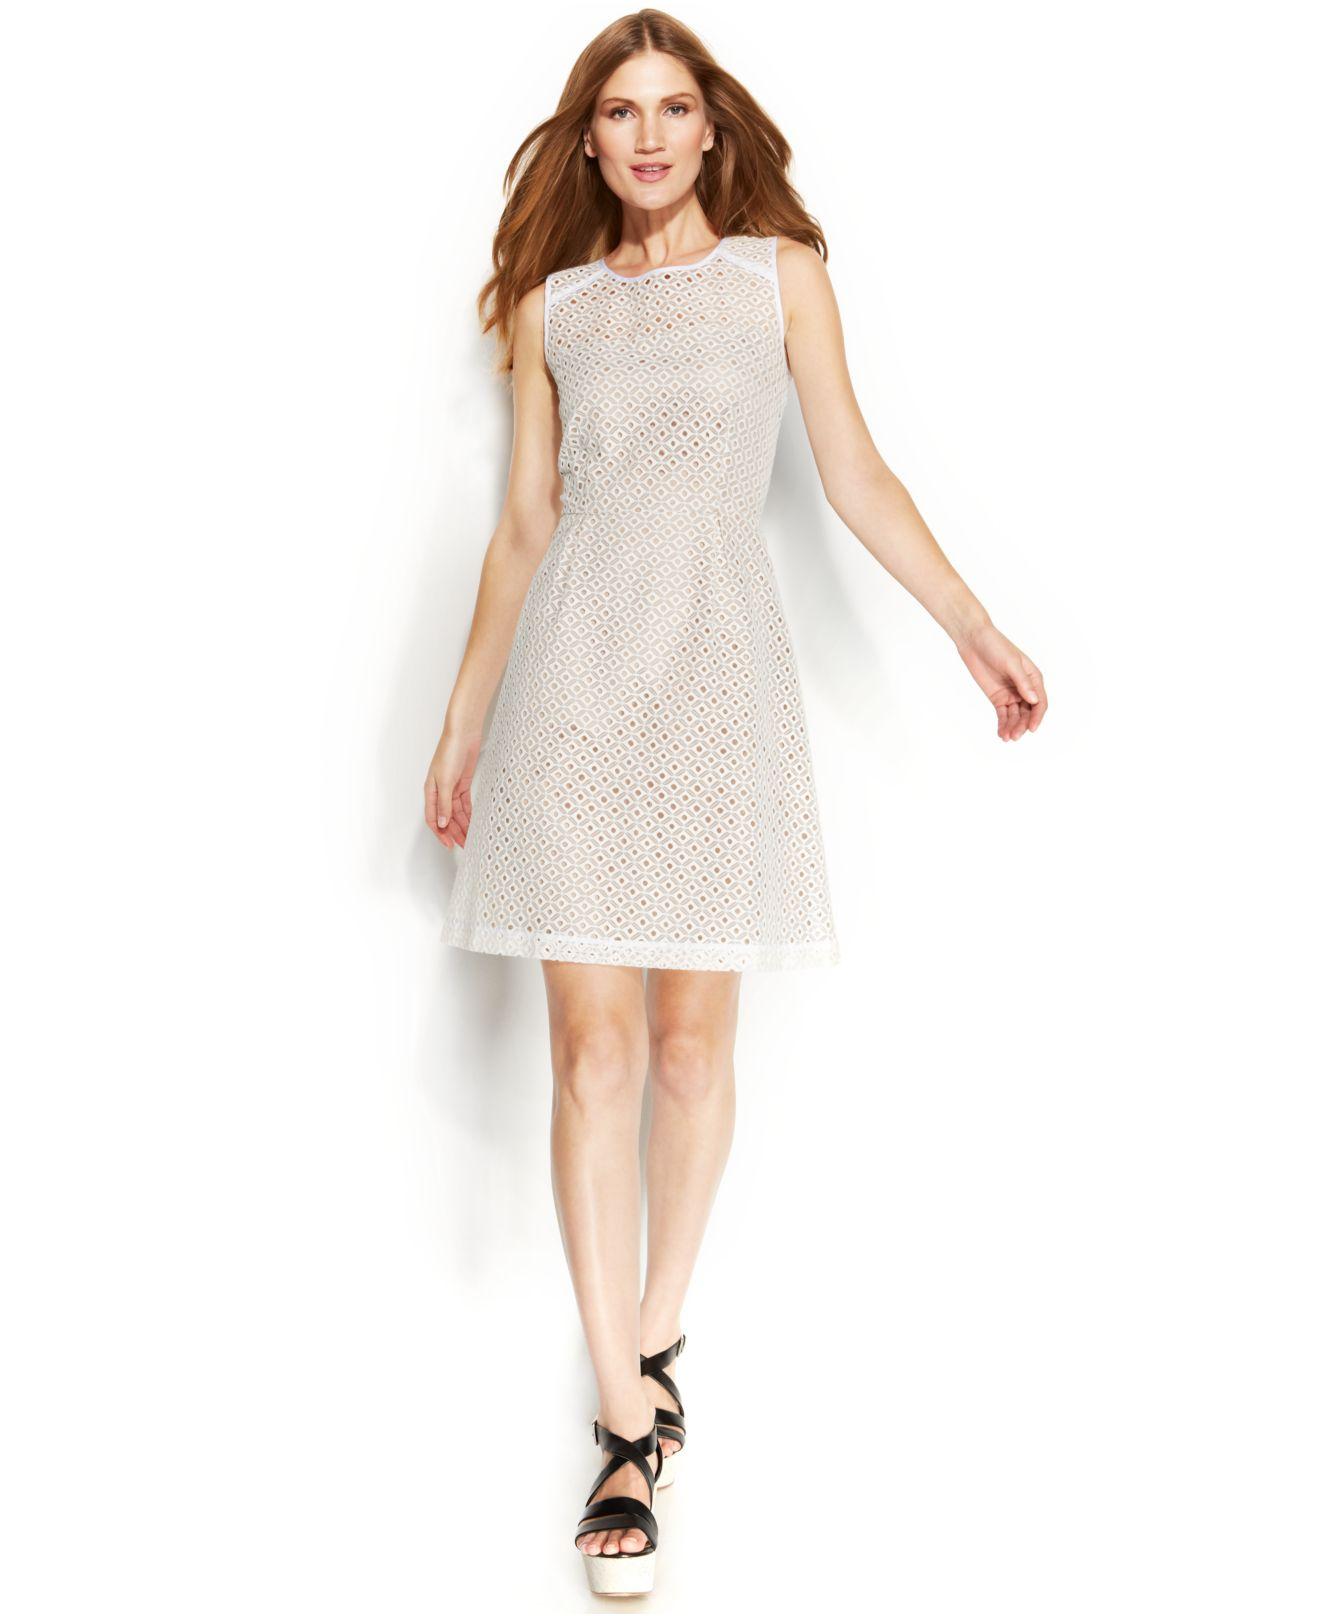 00946a4fe58 Calvin Klein Petite Dresses Dillards - Data Dynamic AG